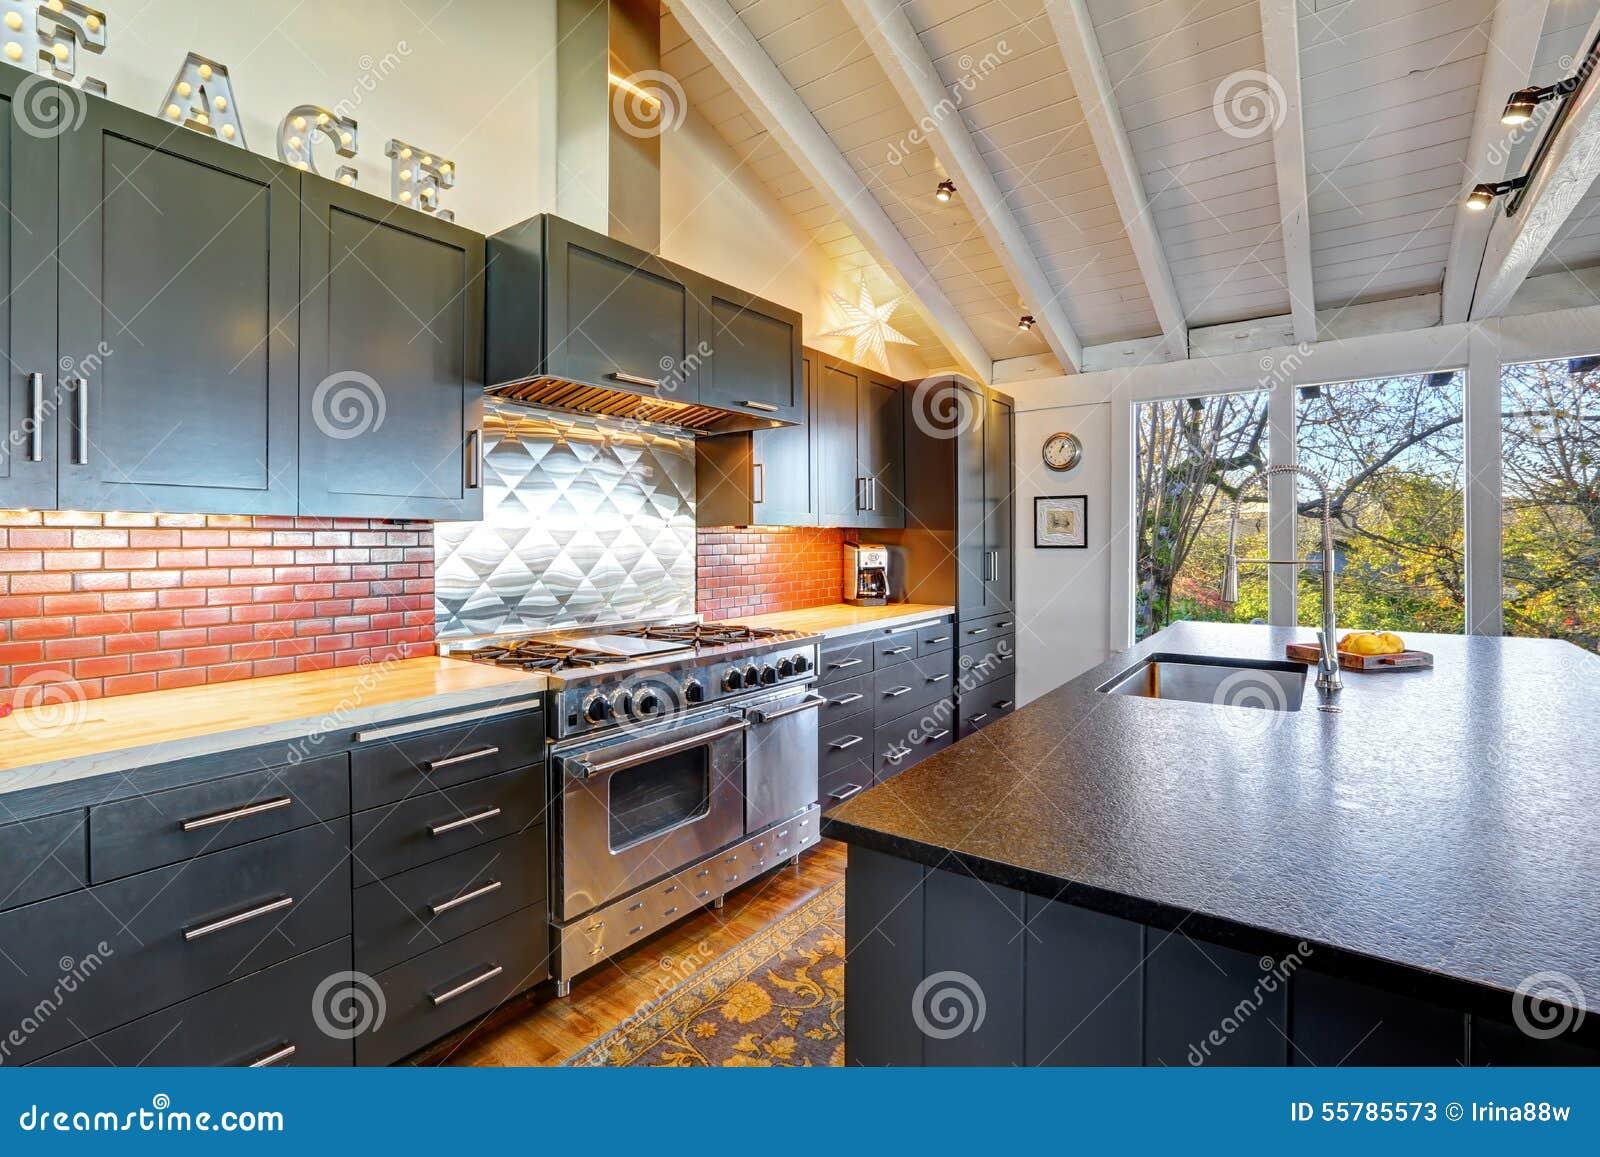 Luxe mooie donkere moderne keuken met gewelfd houten plafond stock ...